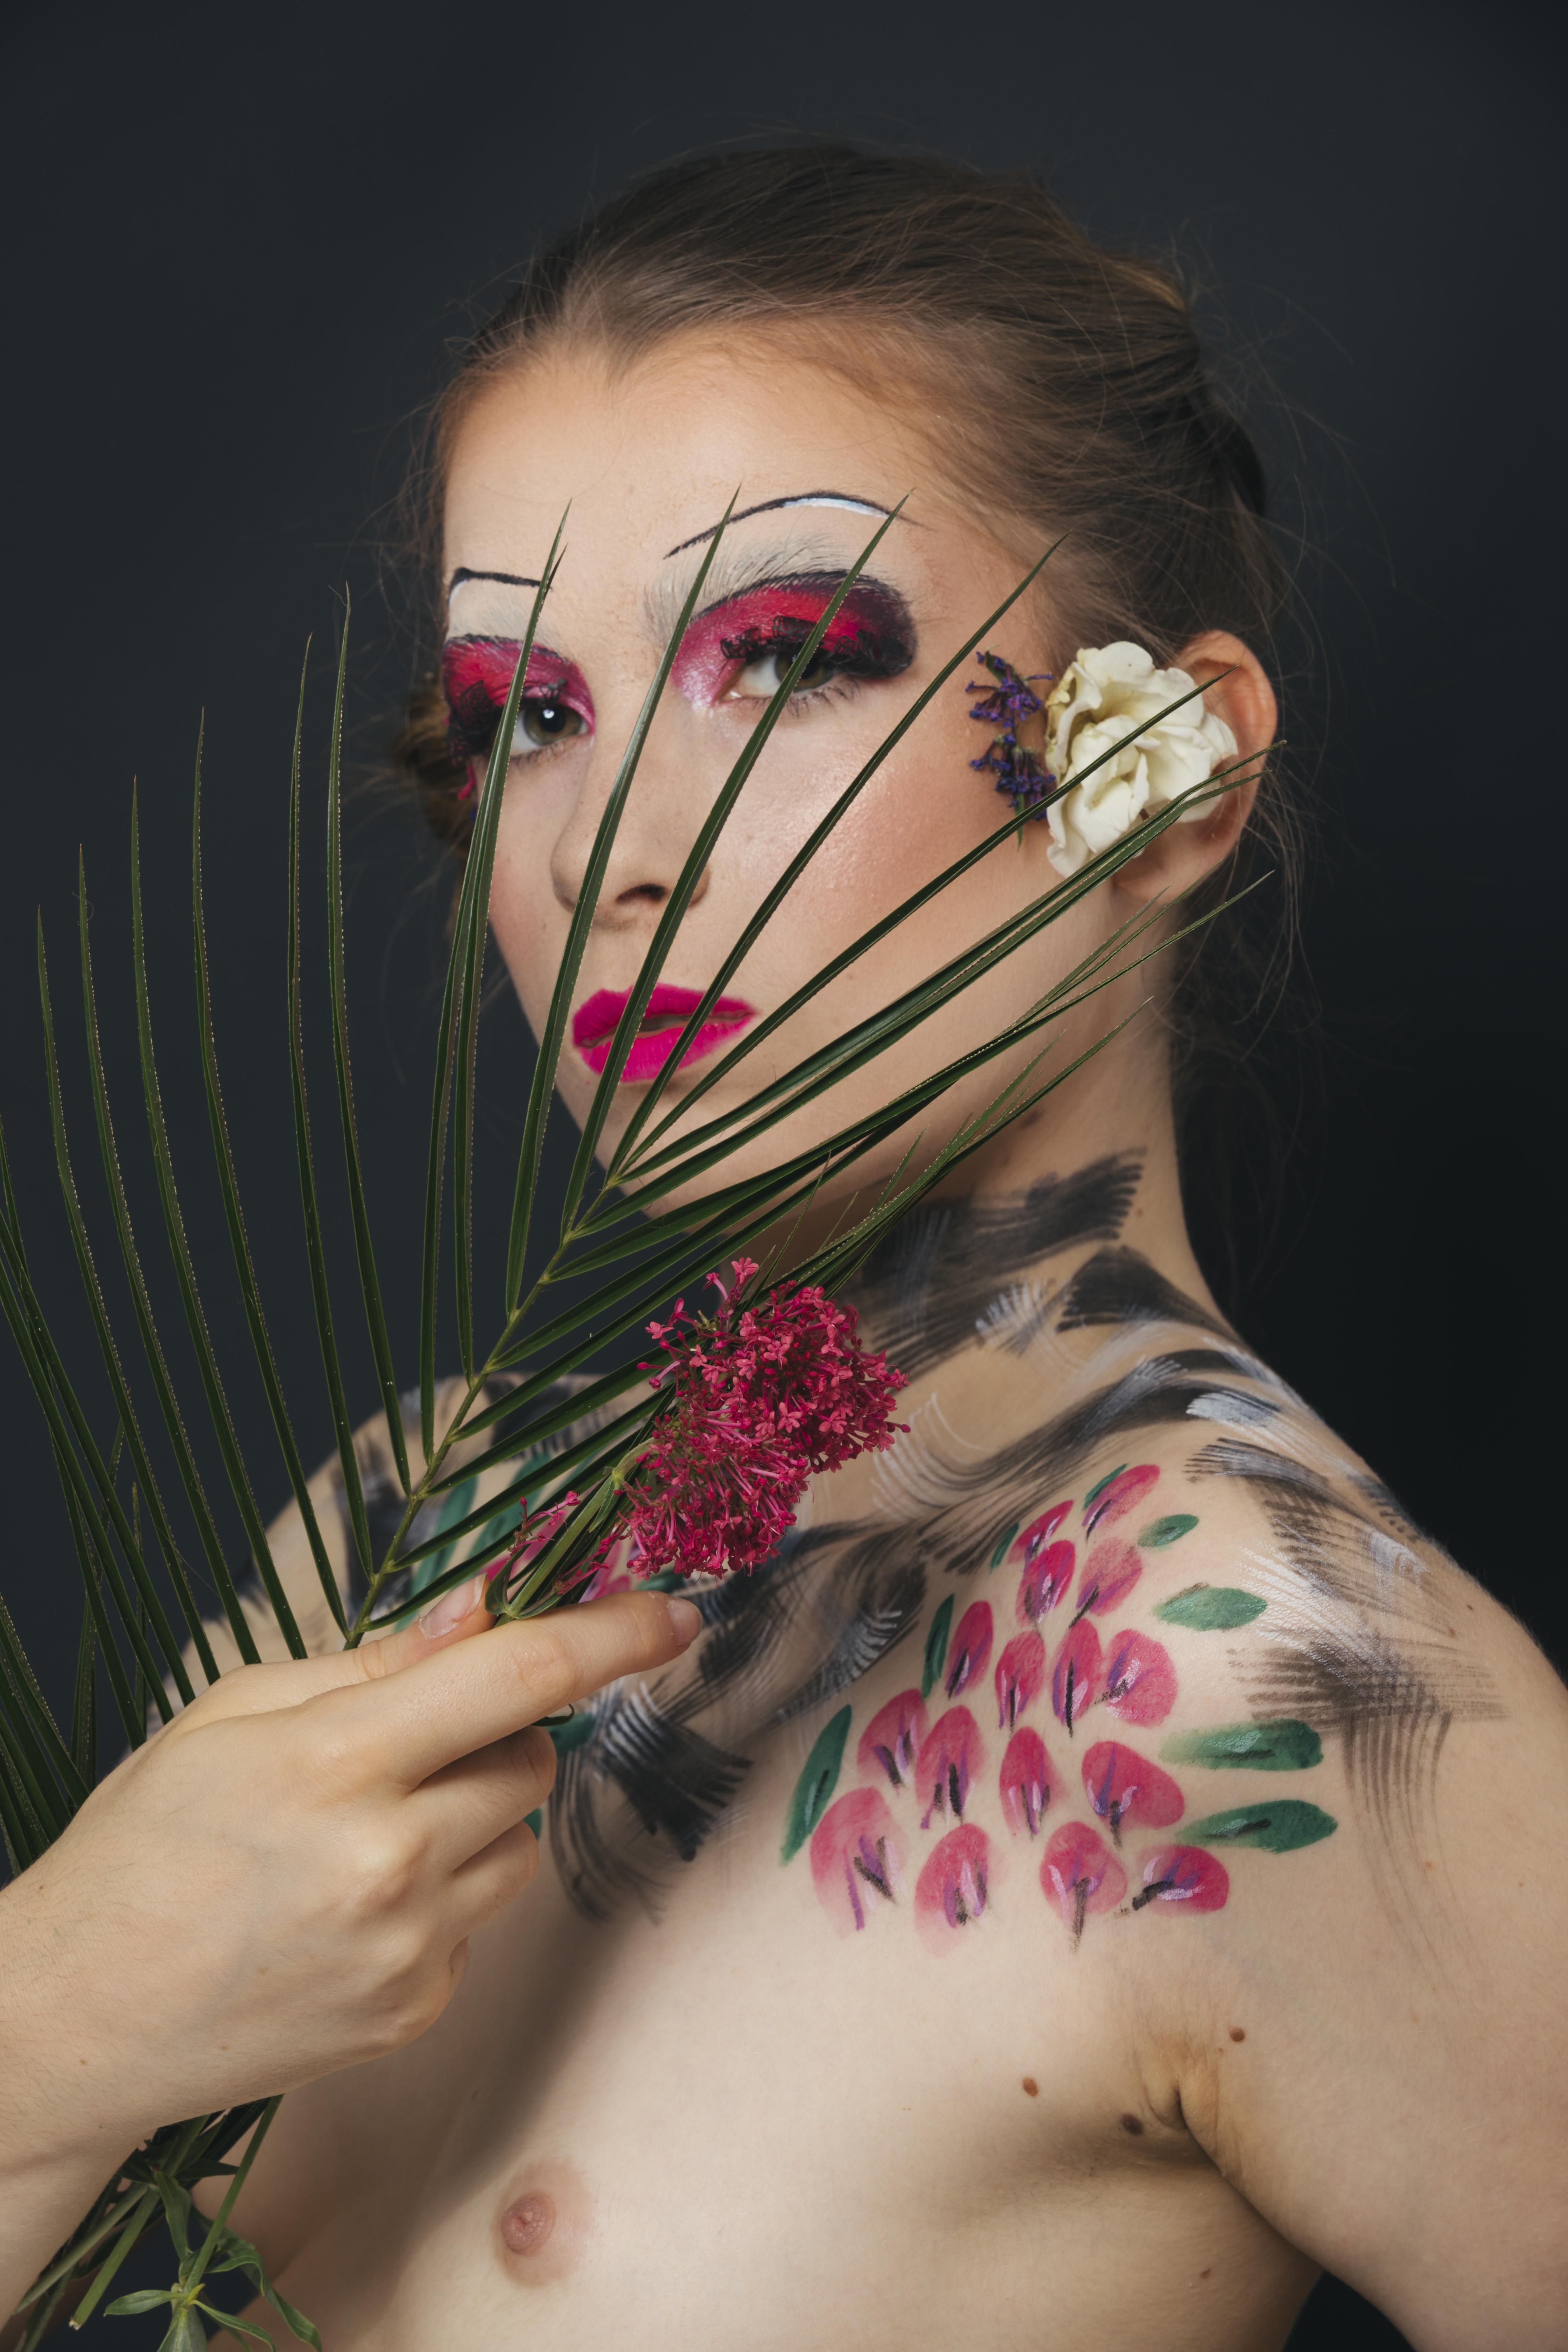 21072019-Studio - Maquillage Floral 342.